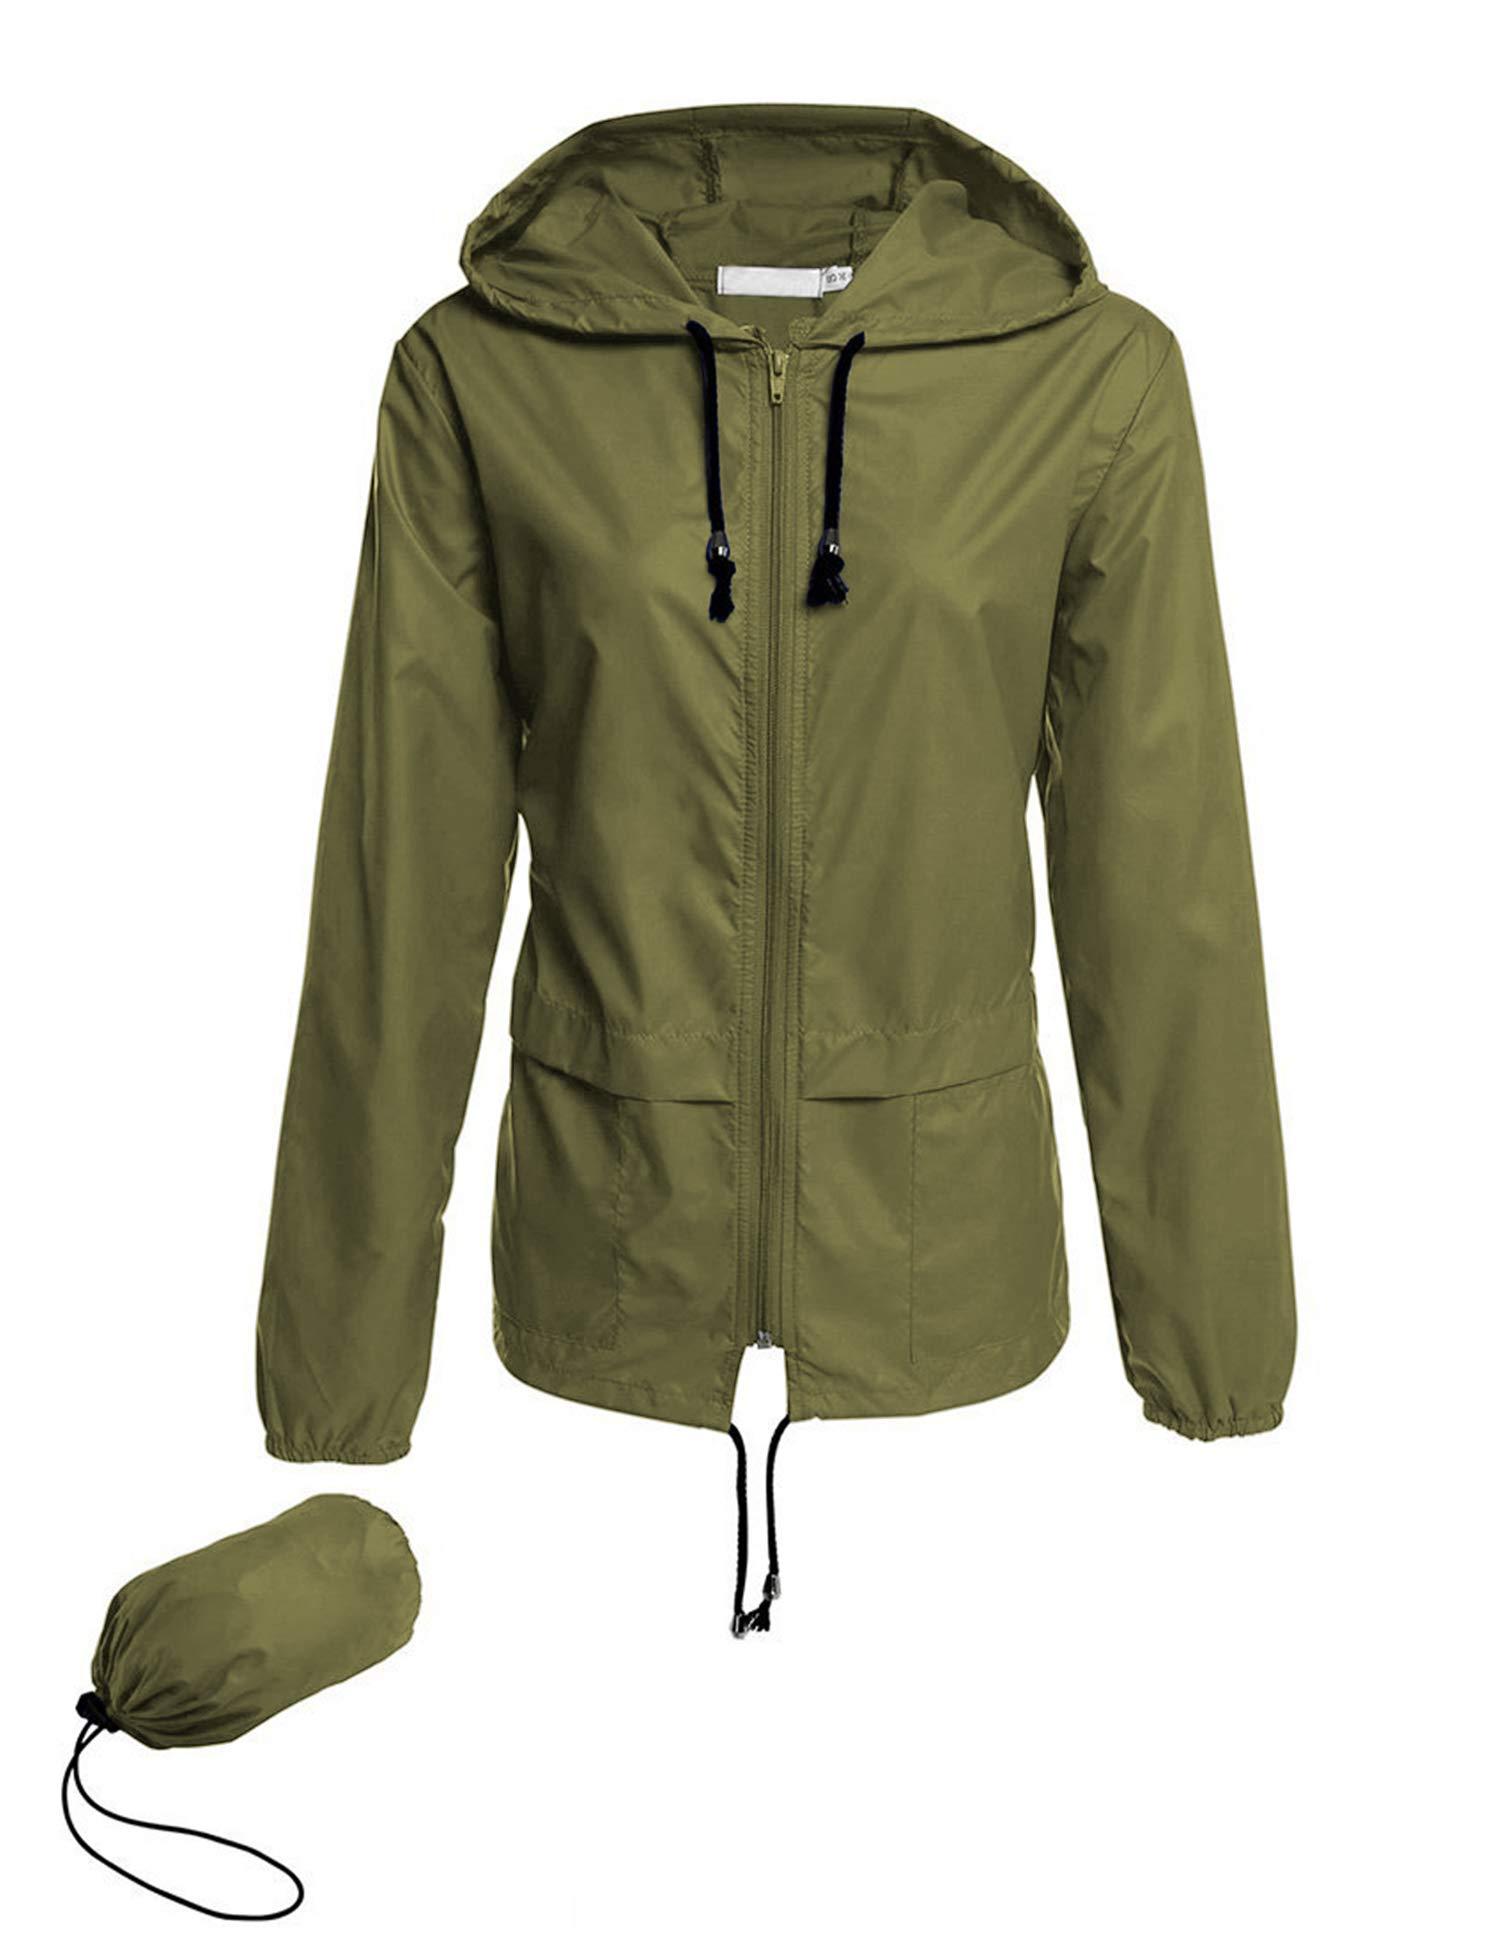 Avoogue Raincoat Women Lightweight Waterproof Rain Jackets Packable Outdoor Hooded Windbreaker